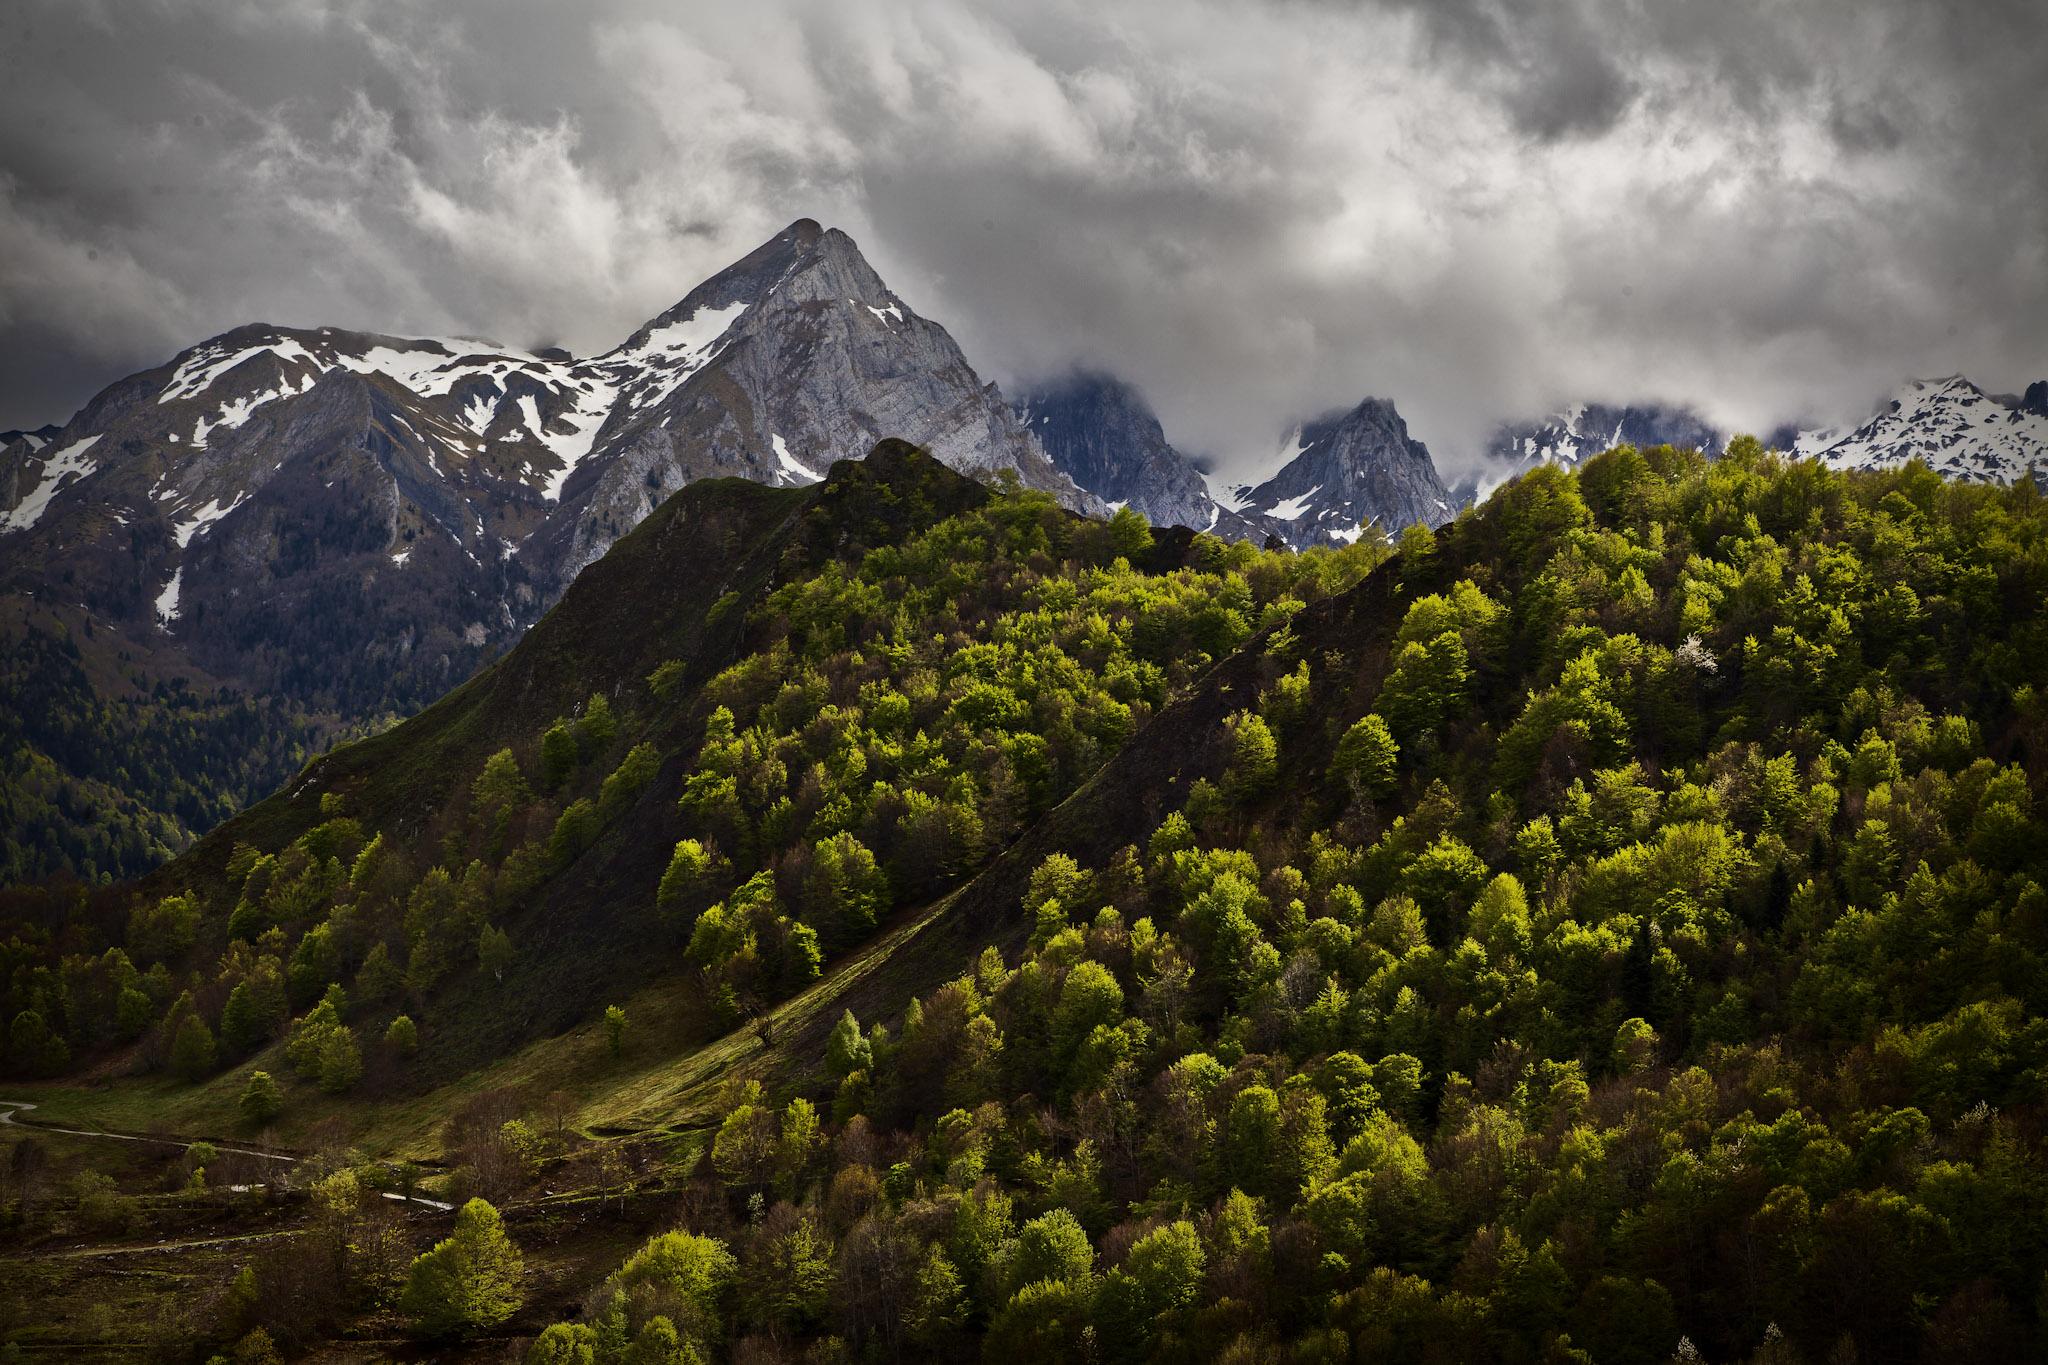 Valle de Lescun - Vallée d´Aspe - Fotos del Valle del Aragón, Mikel Besga